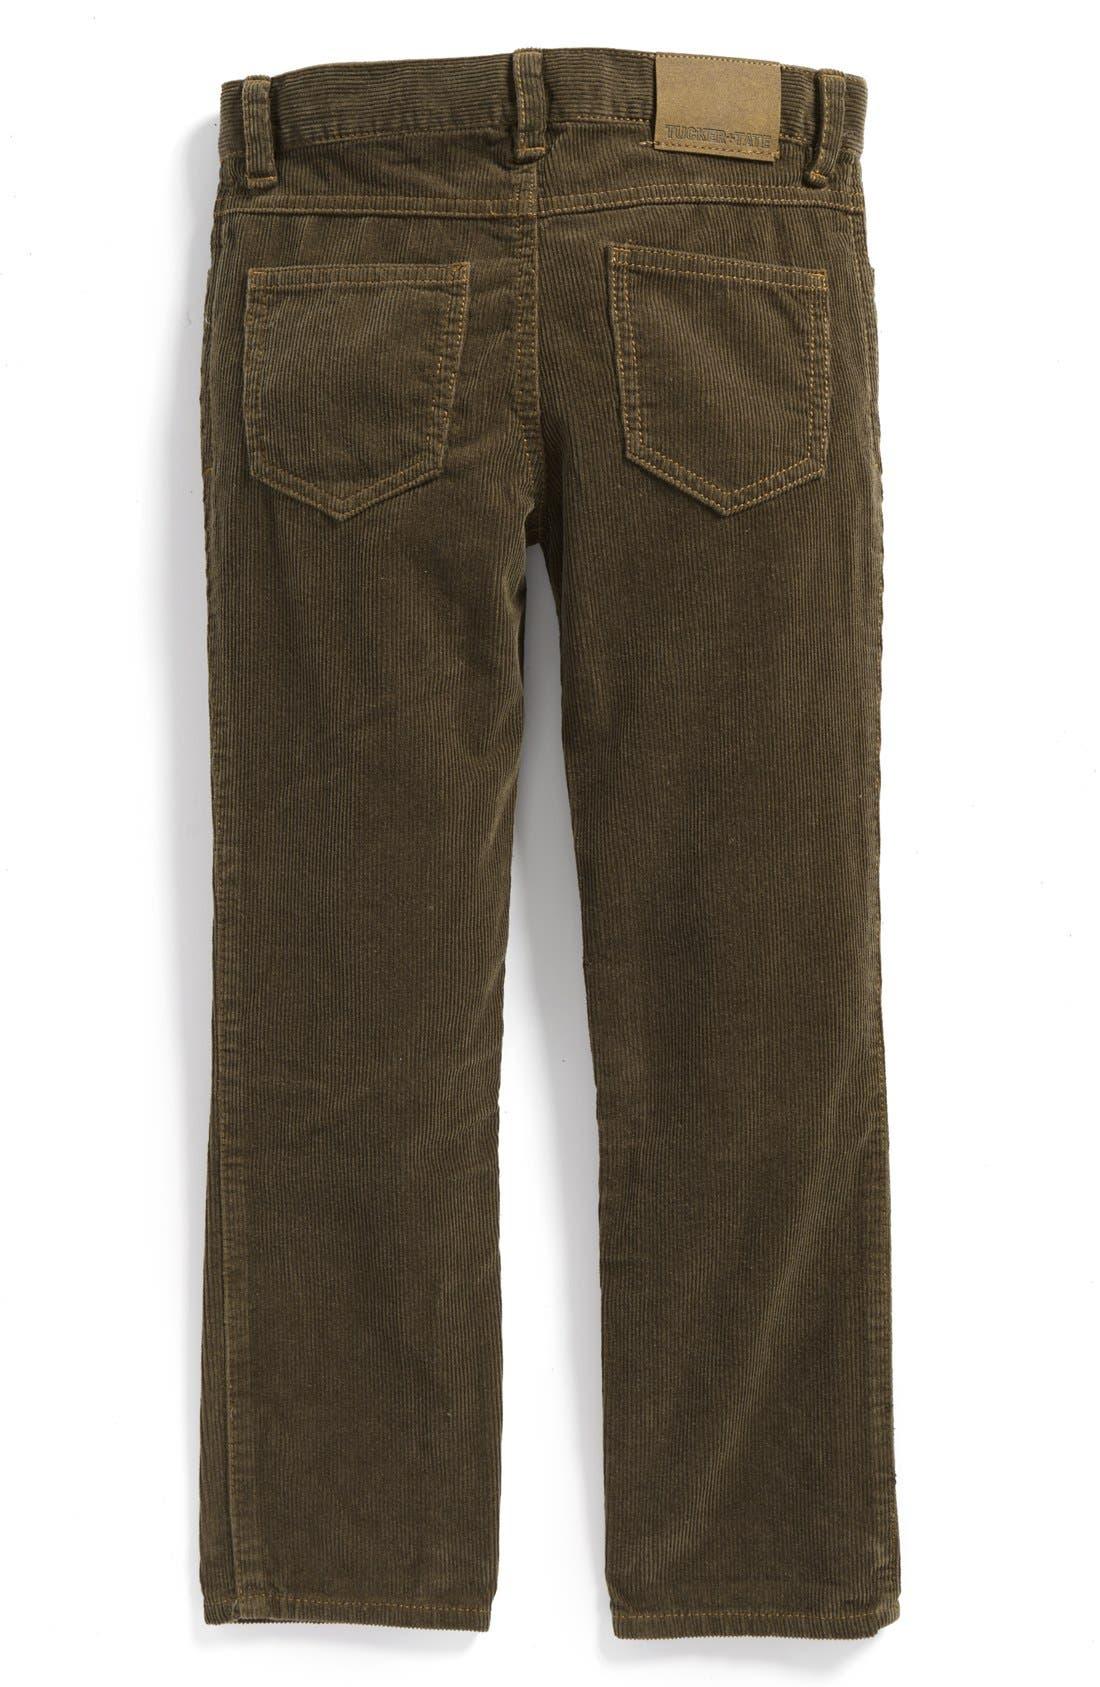 Alternate Image 2  - Tucker + Tate 'Townsend' Corduroy Pants (Little Boys & Big Boys)